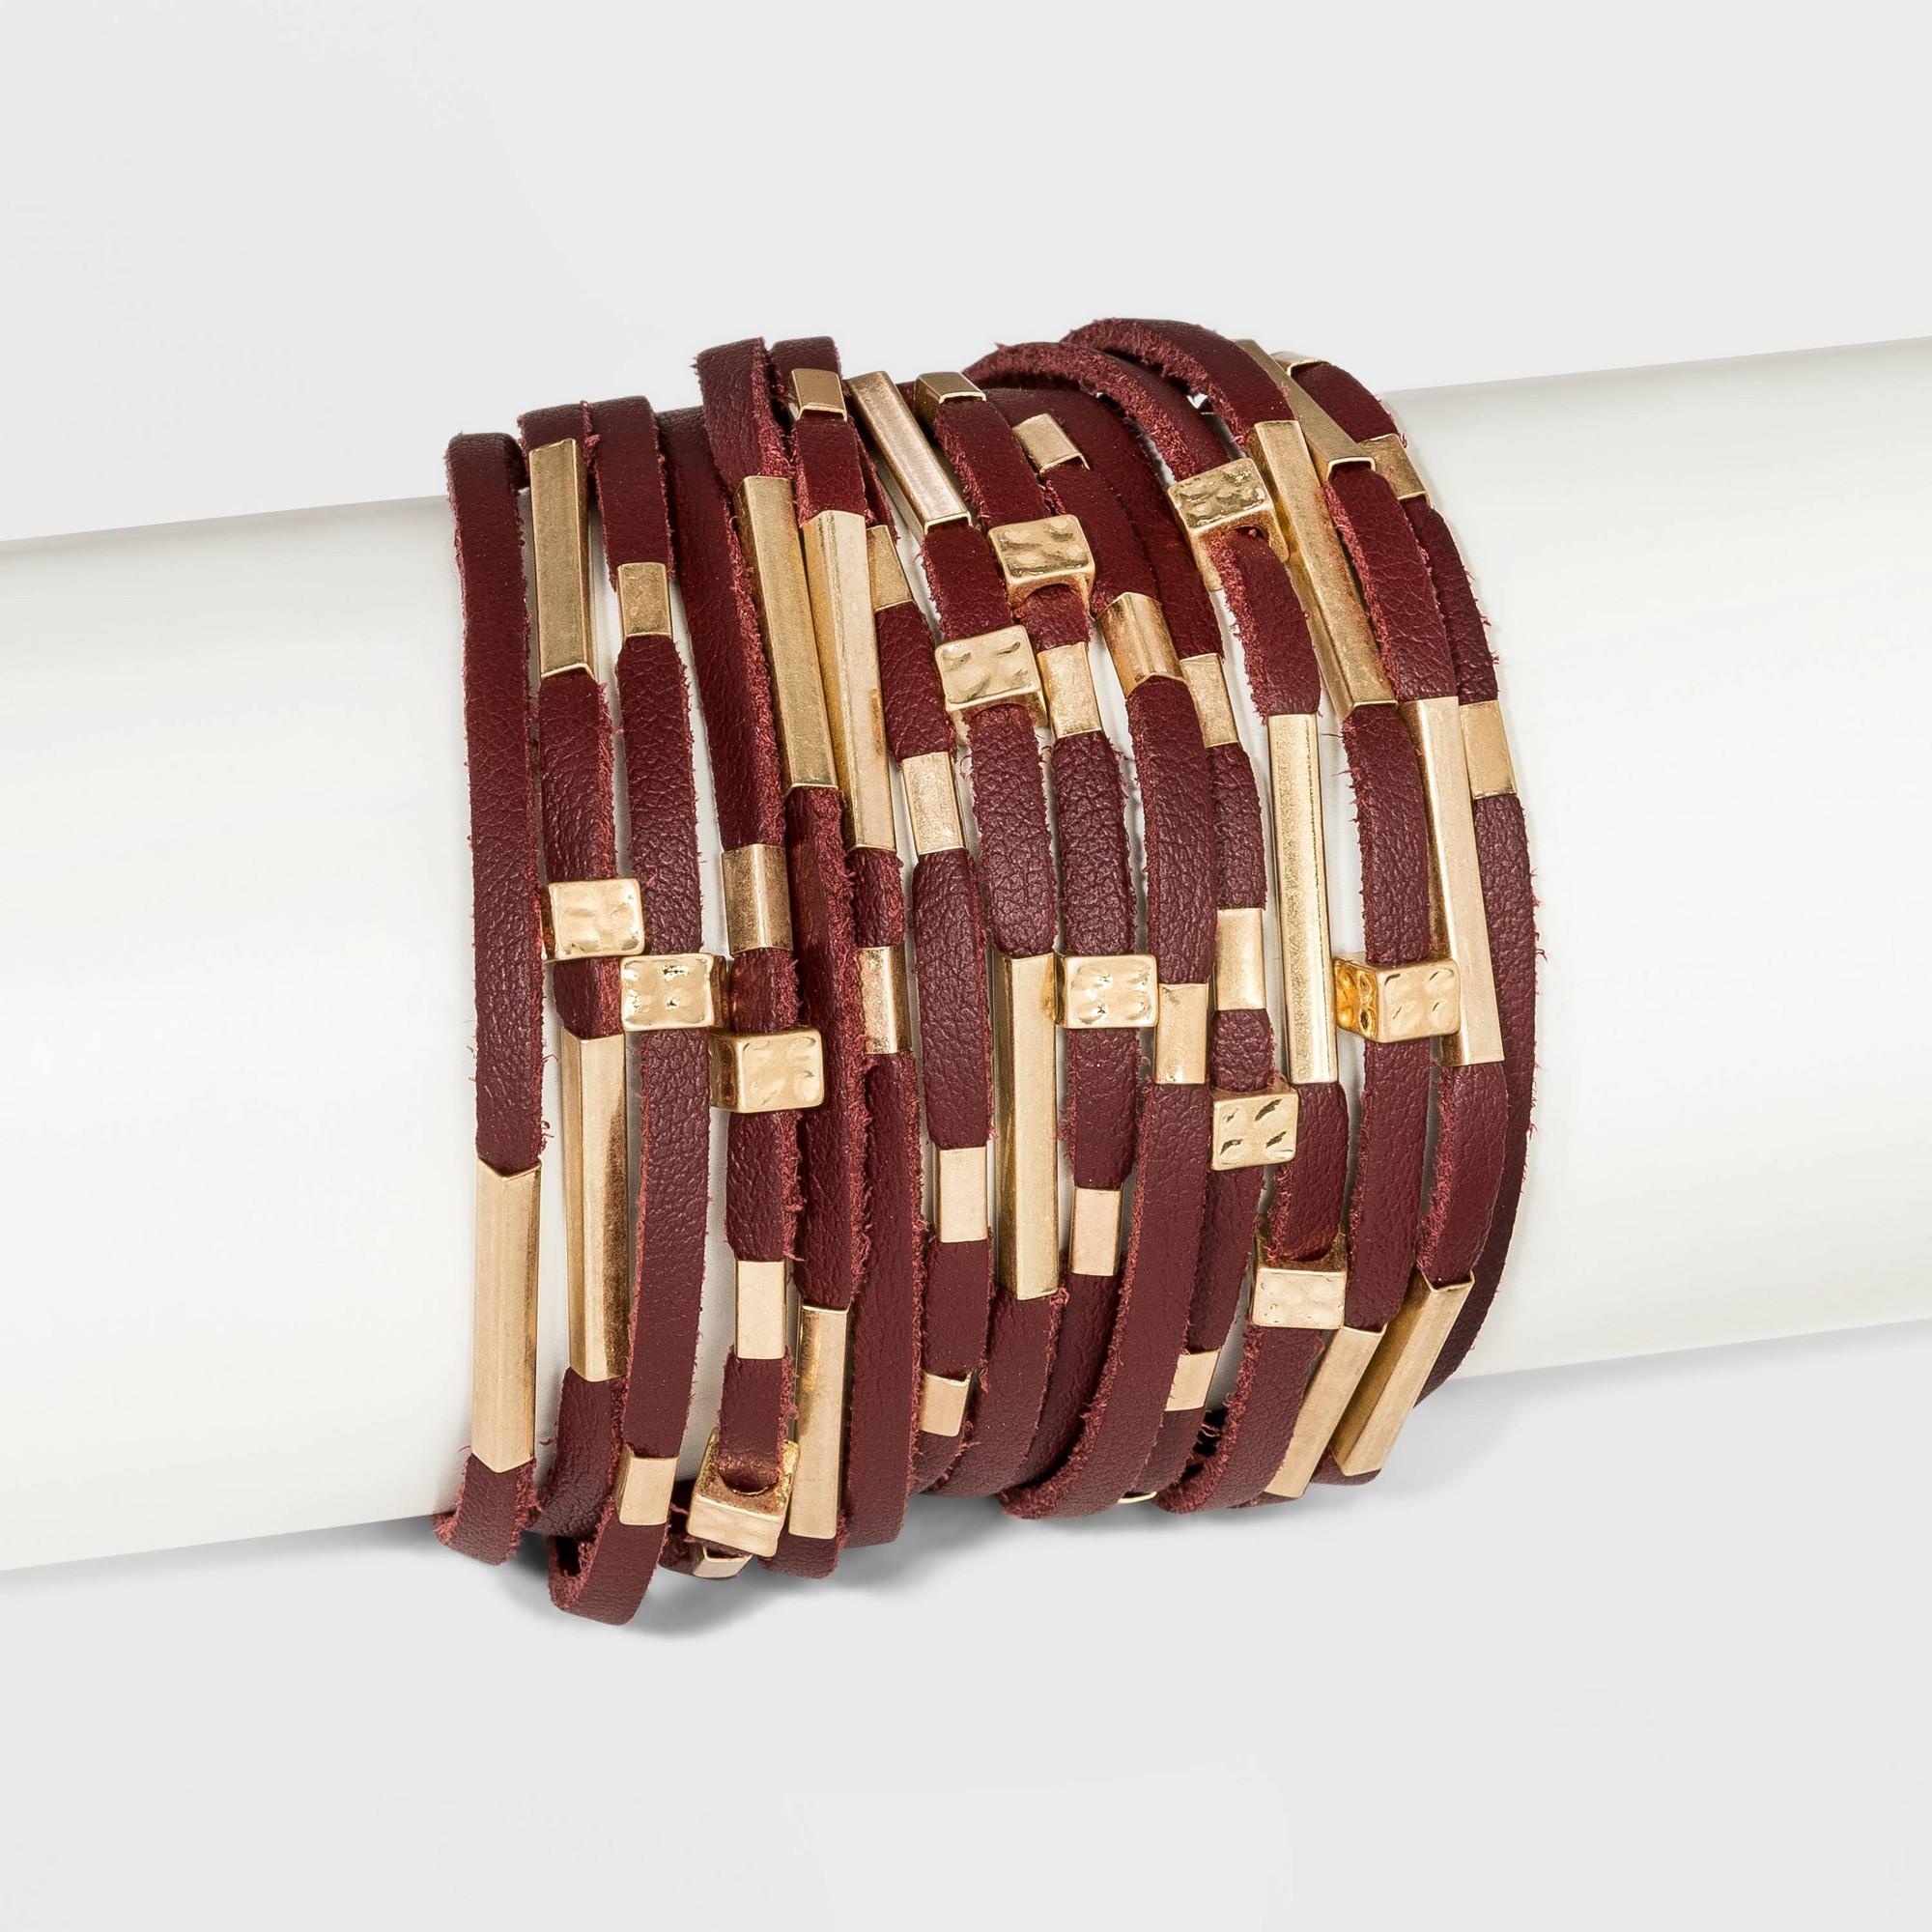 Simulated Leather and Tube Slider Magnetic Bracelet - Universal Thread Royal Burgundy, Women's